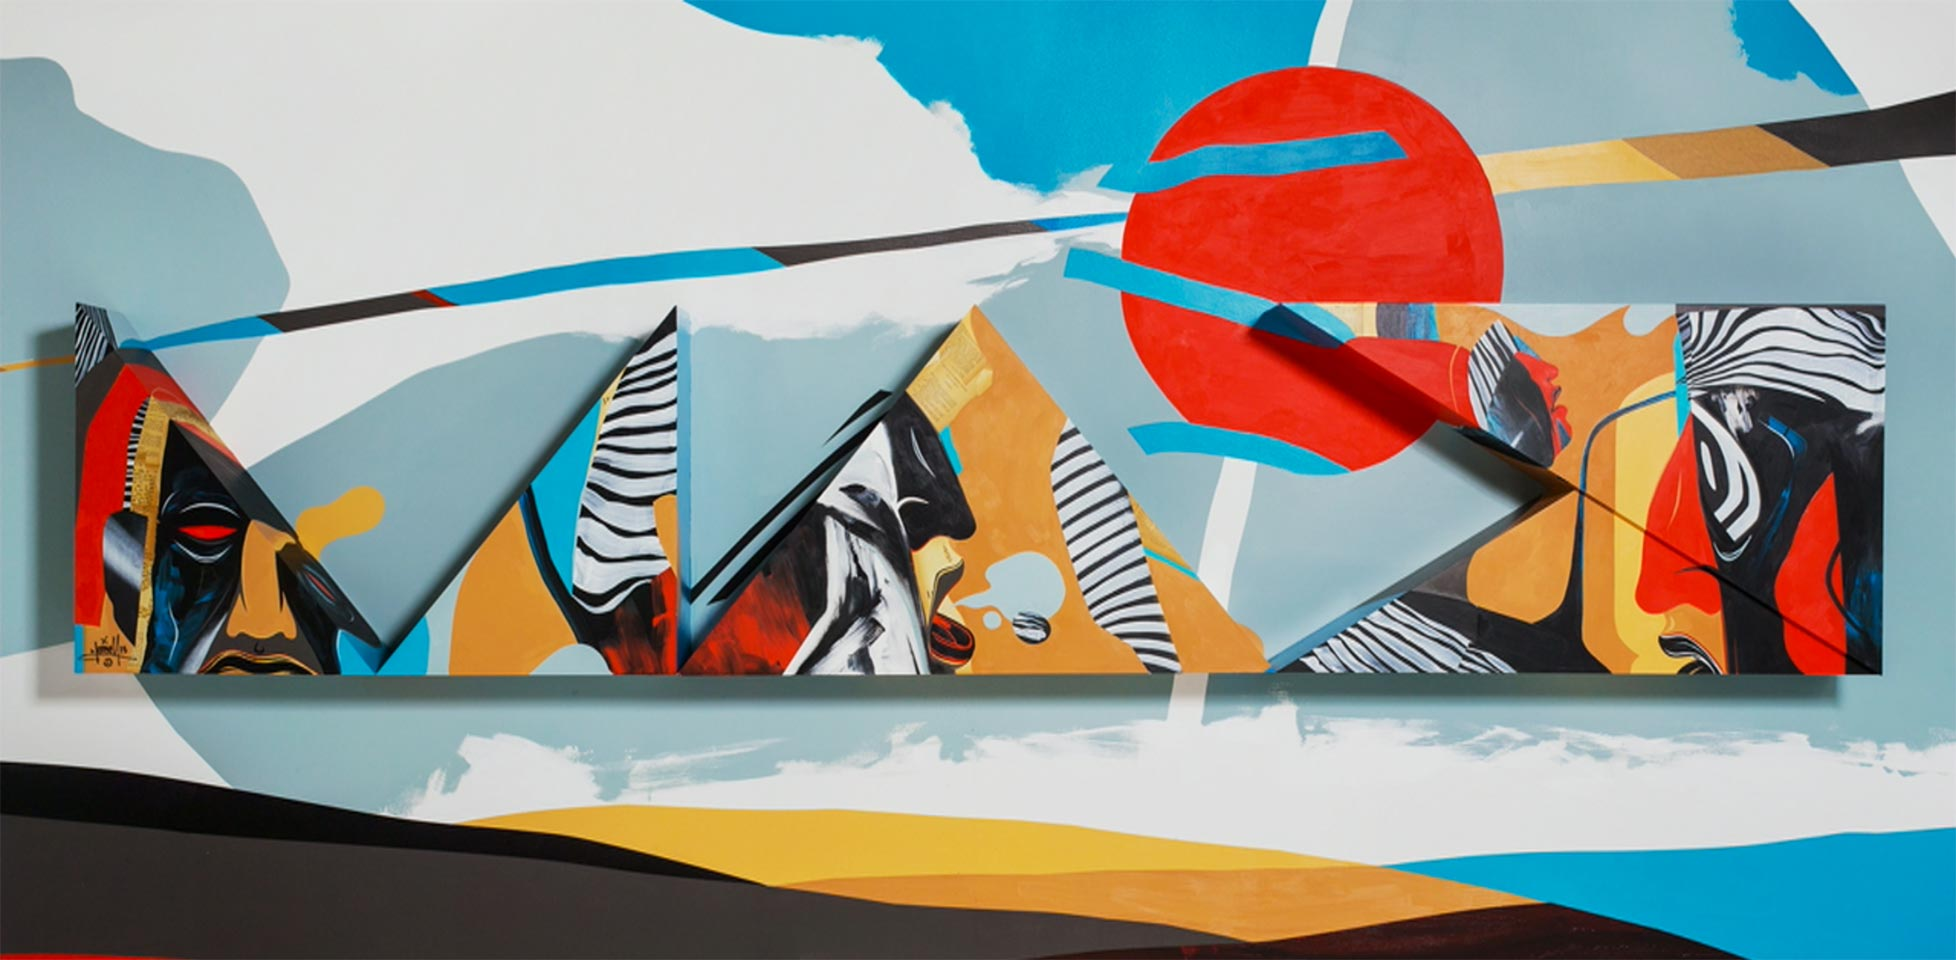 Adobe Unveils a Revolutionary UX Design Application at MAX